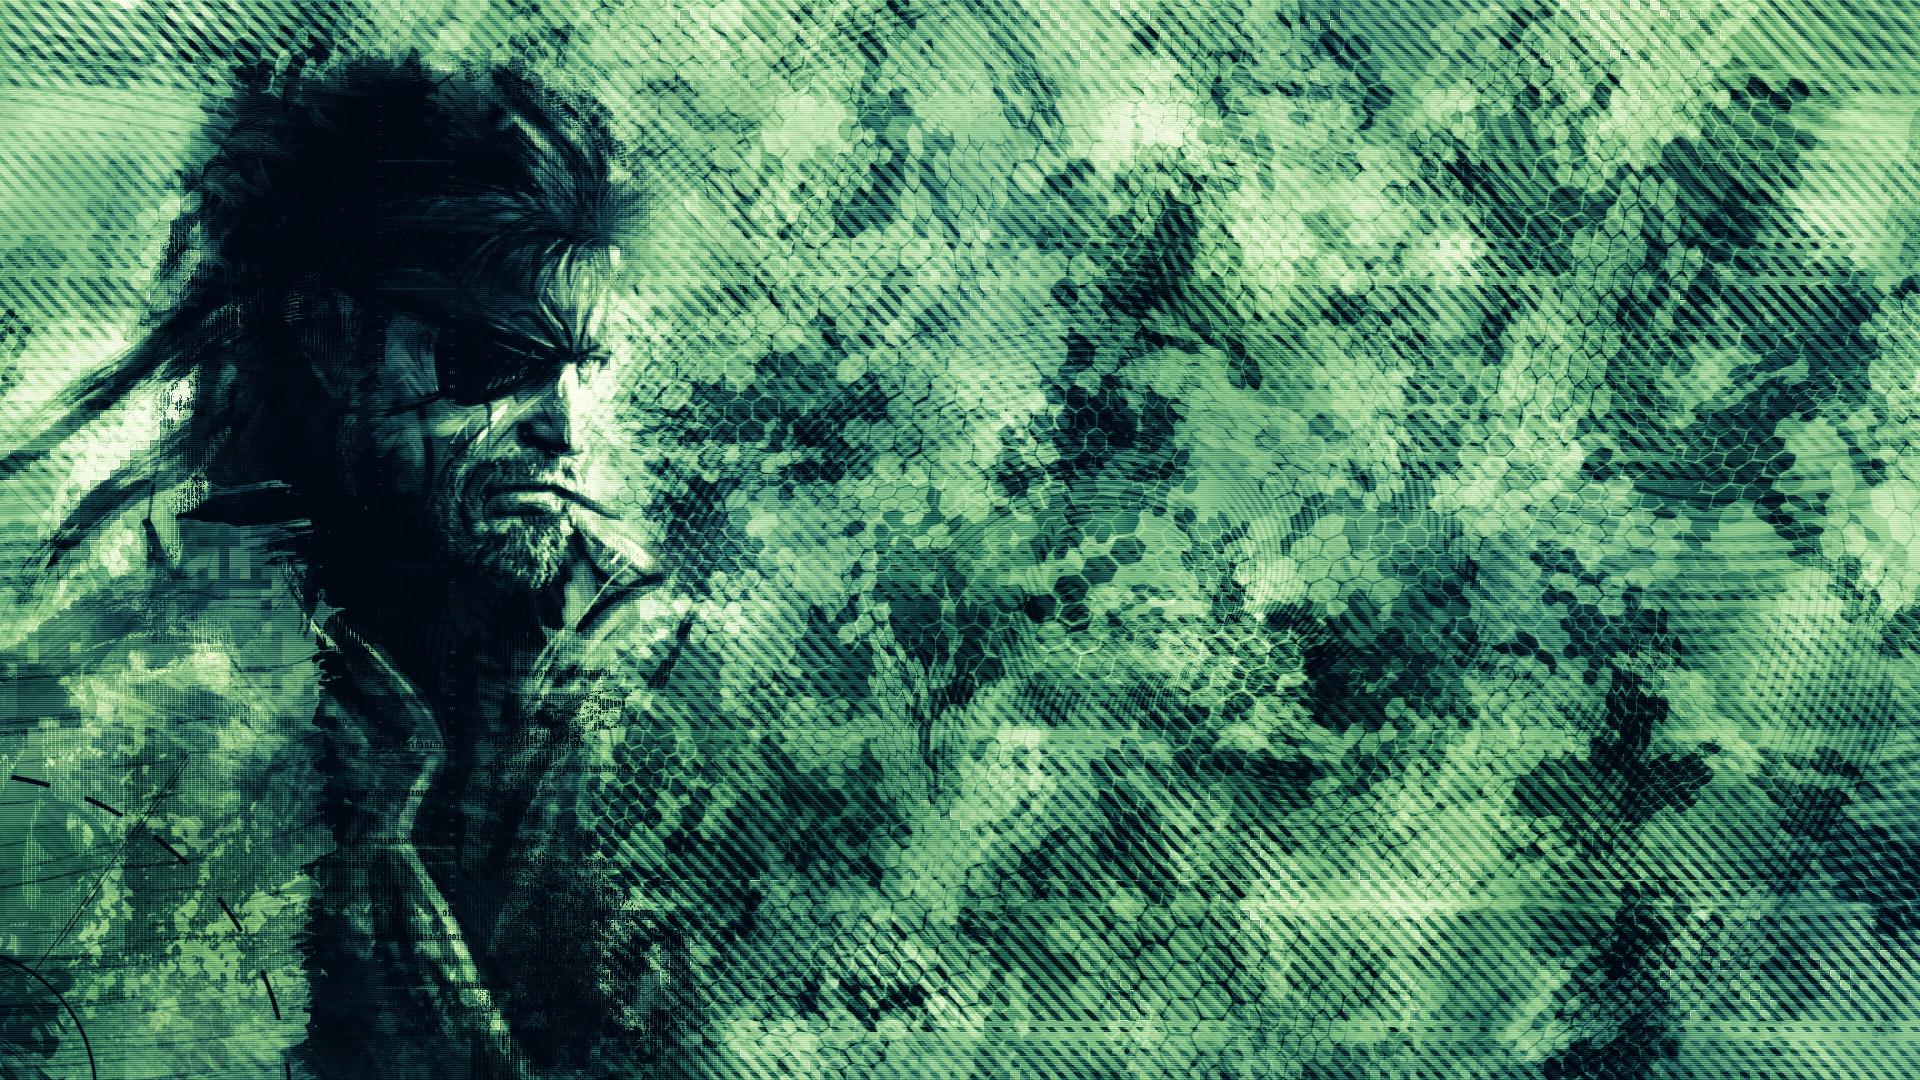 Camouflage Art - Page 2 Big_boss_hd_wallpaper_by_gurt1337